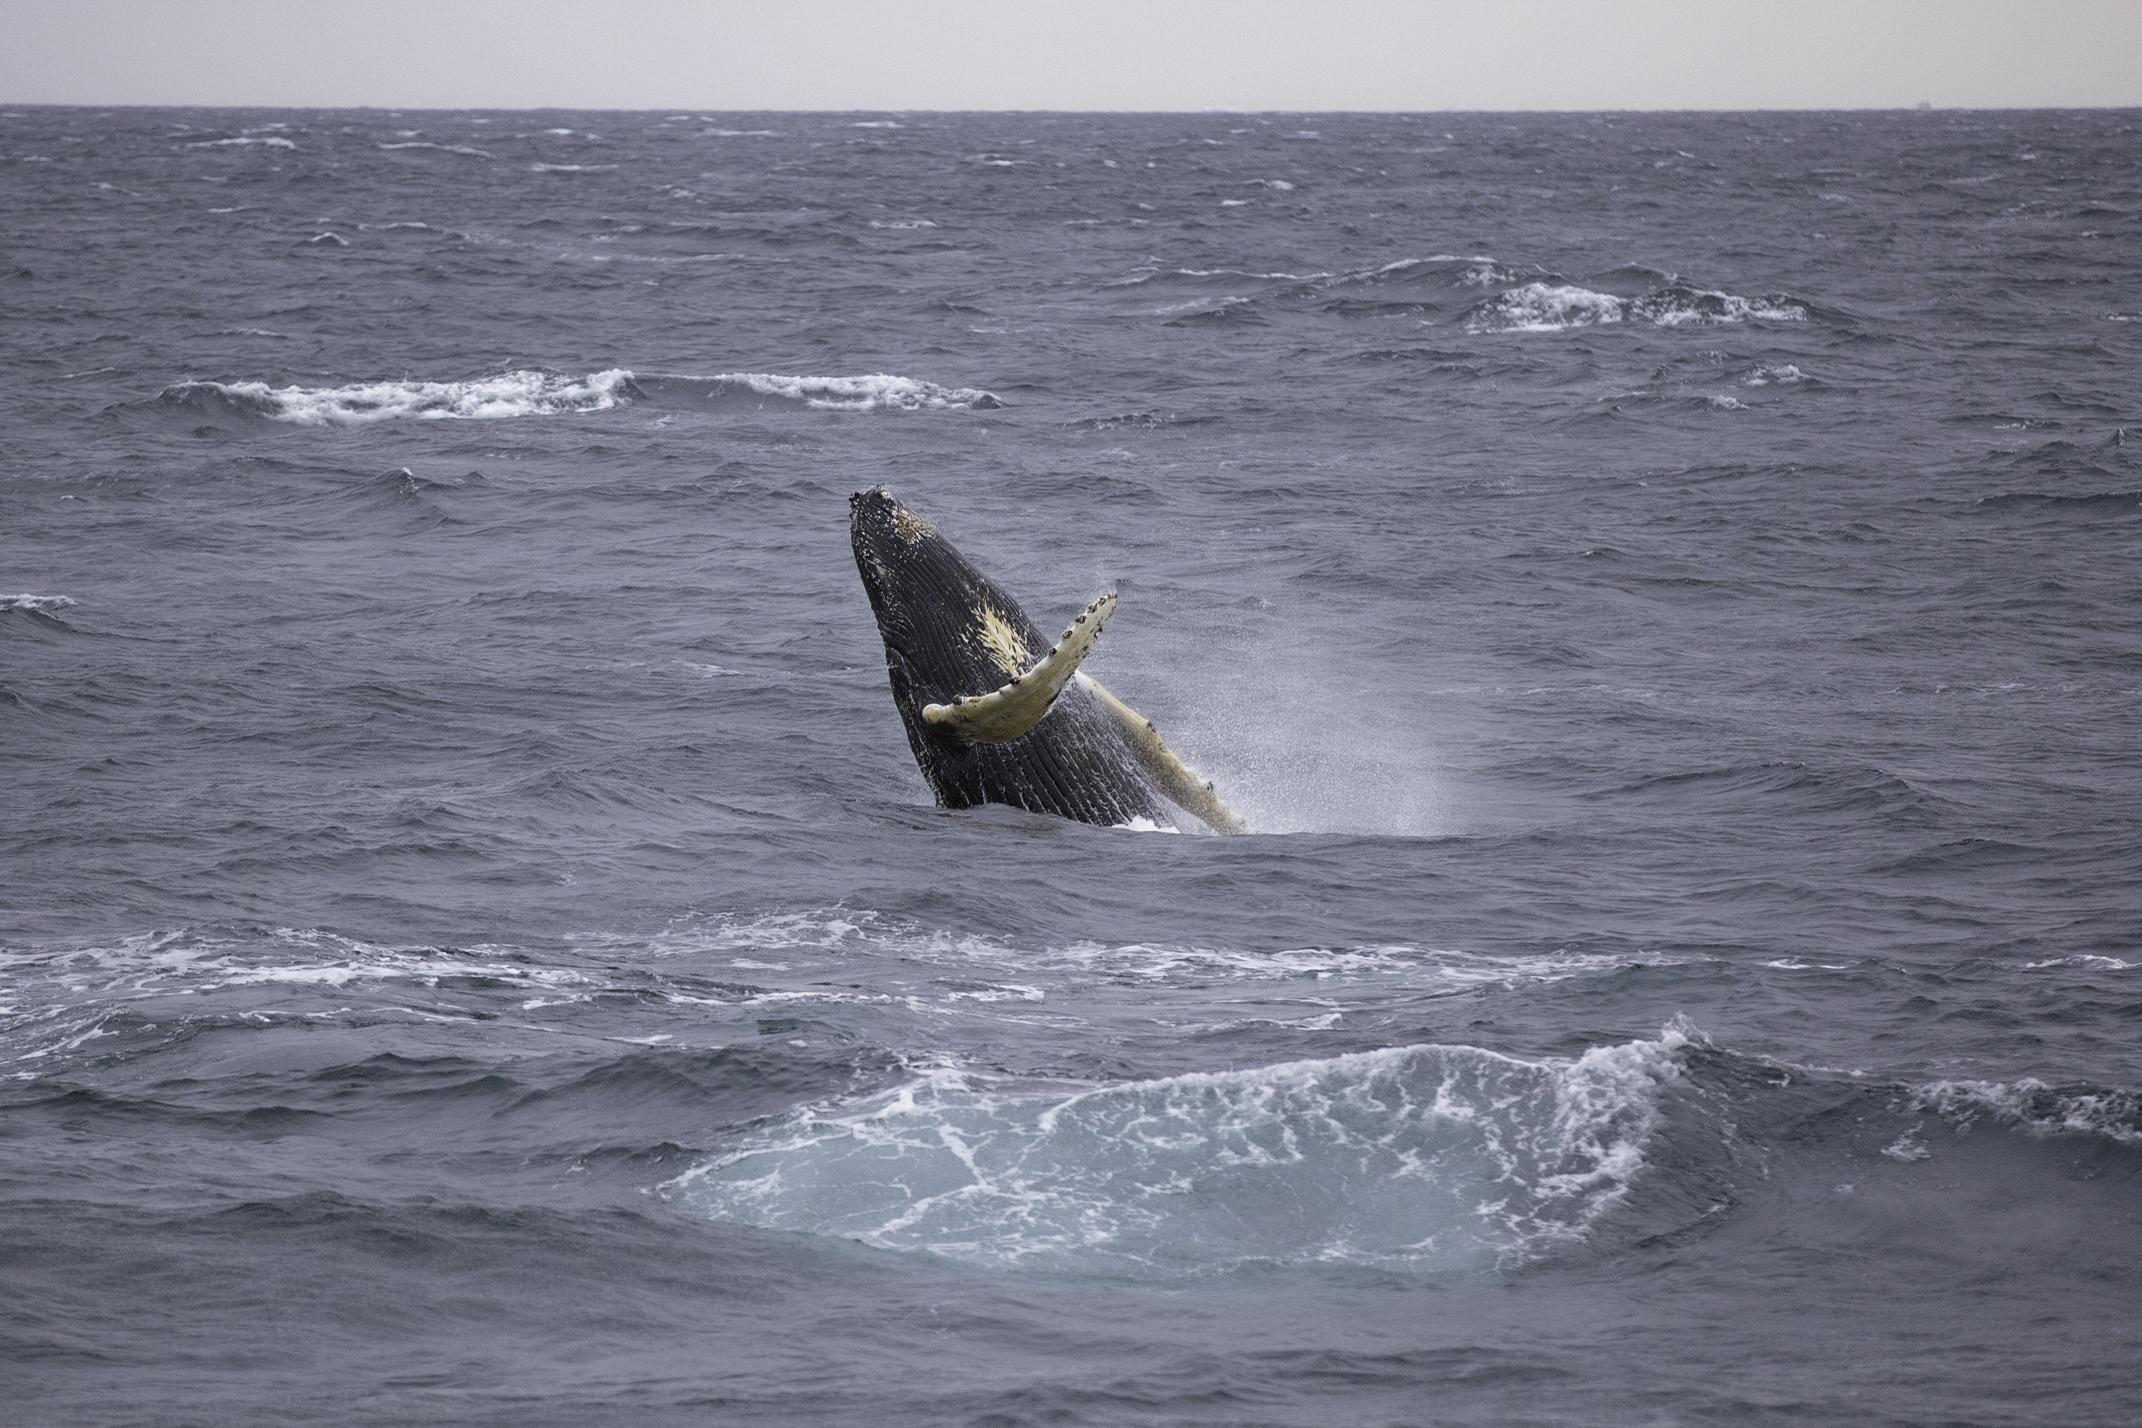 A humpback whale takes a leap.